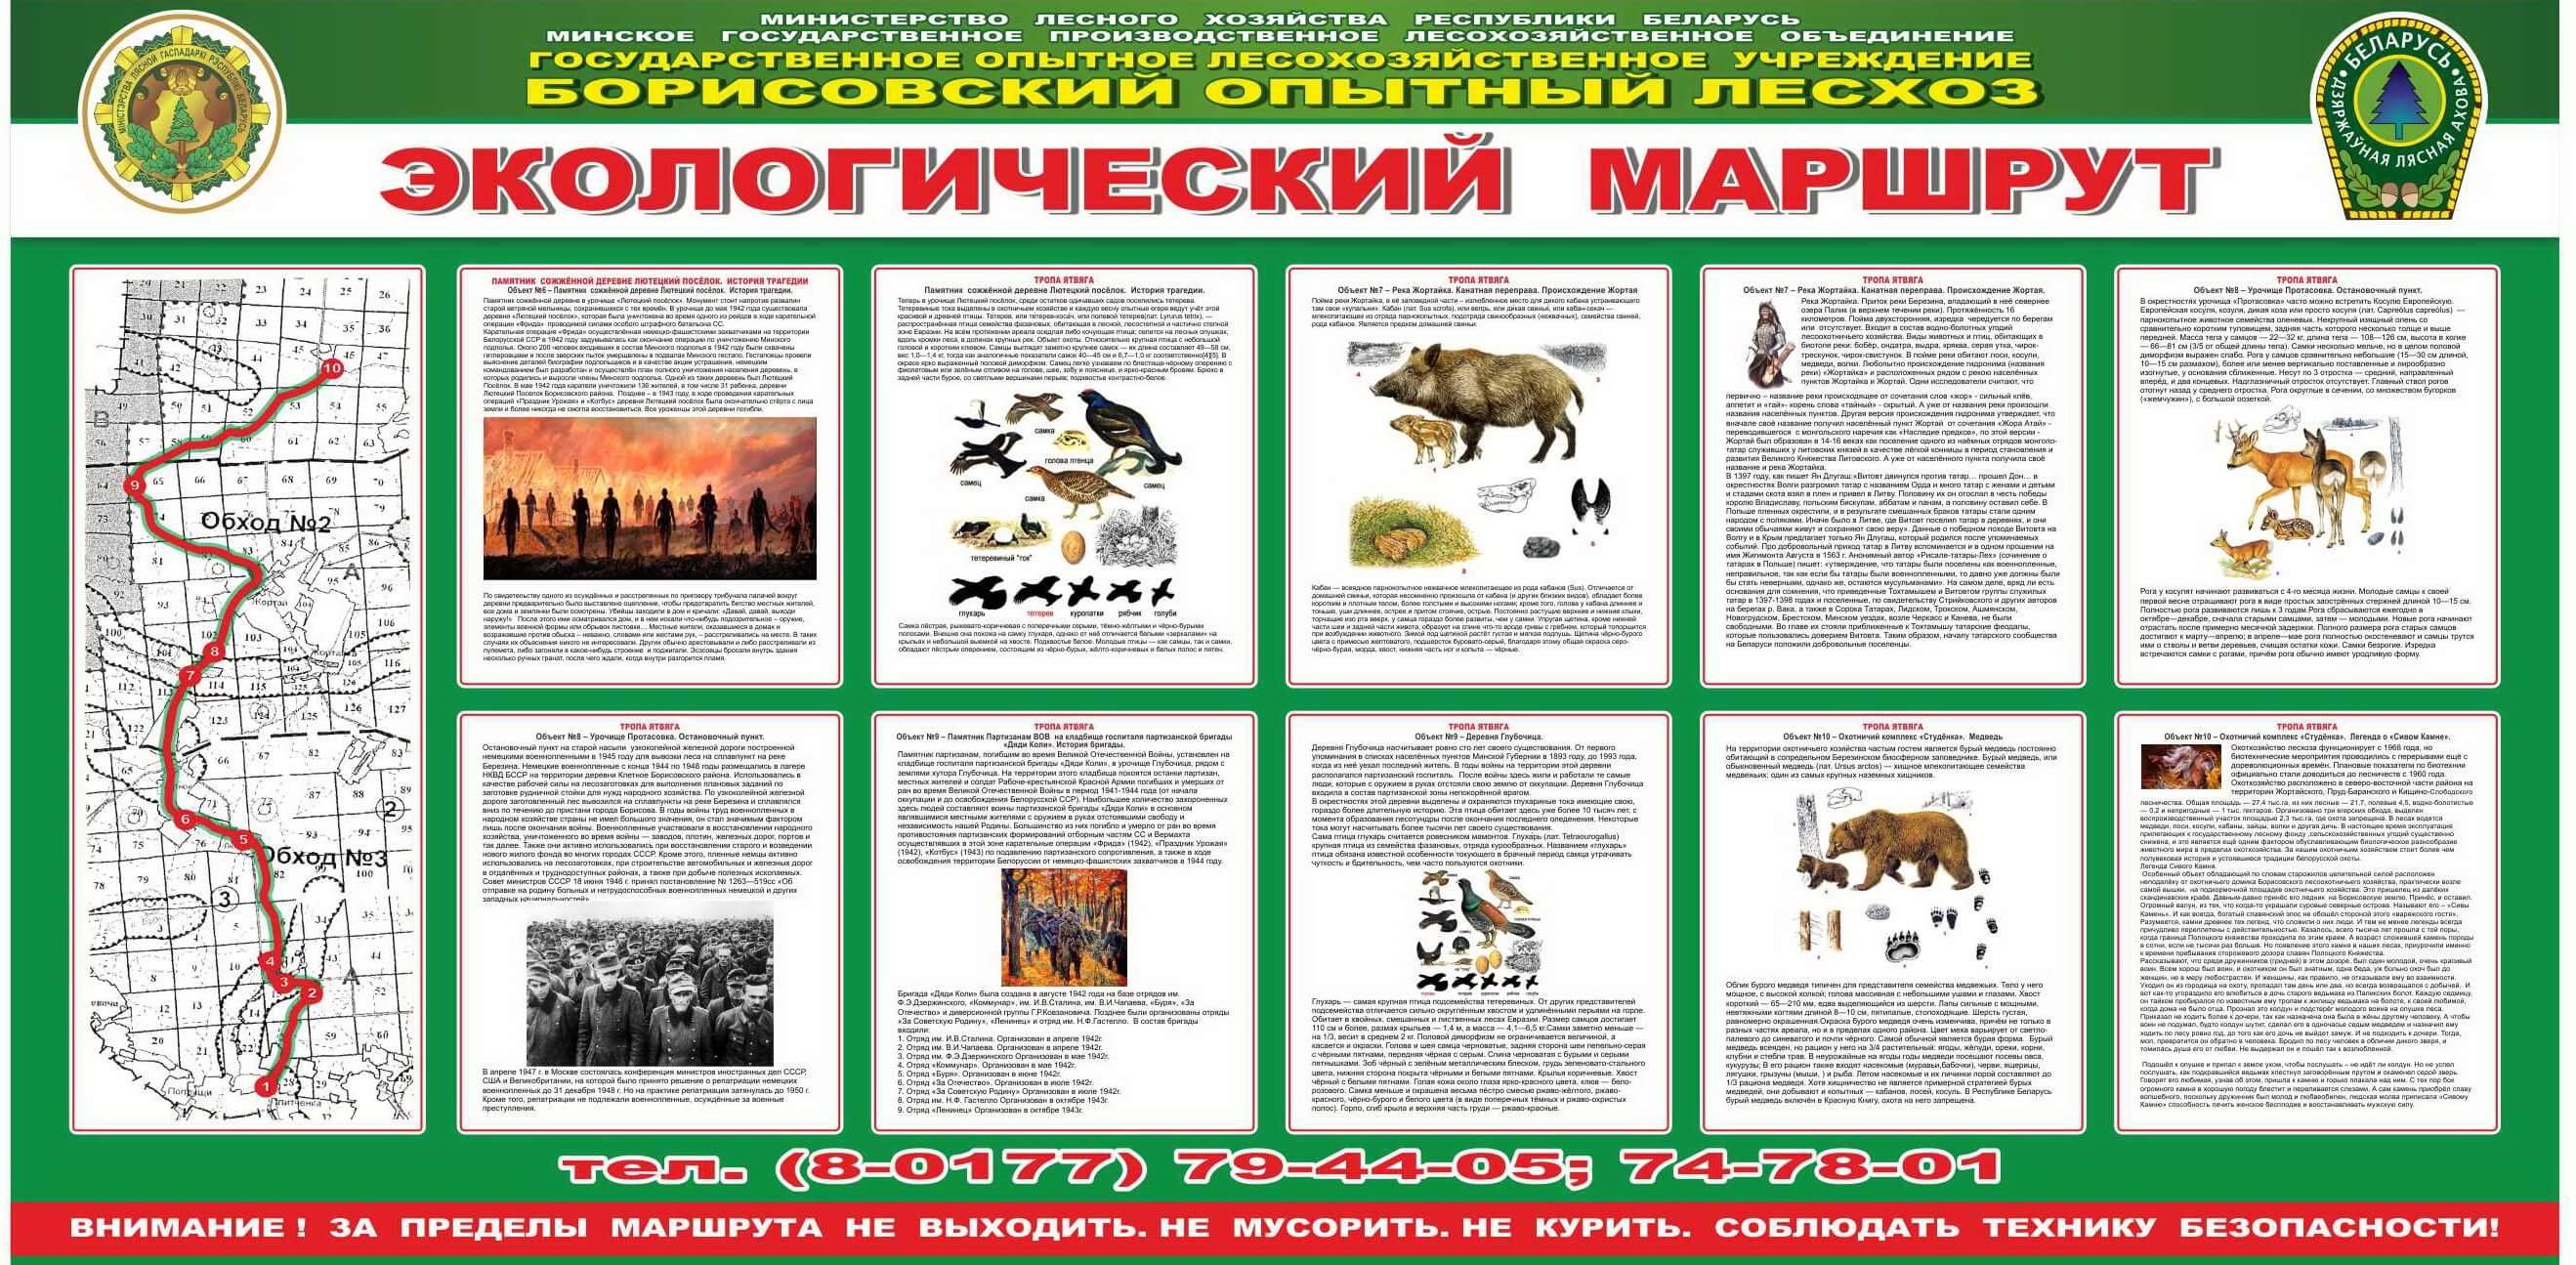 http://borisovleshoz.by/images/razdeli/tropa.jpg